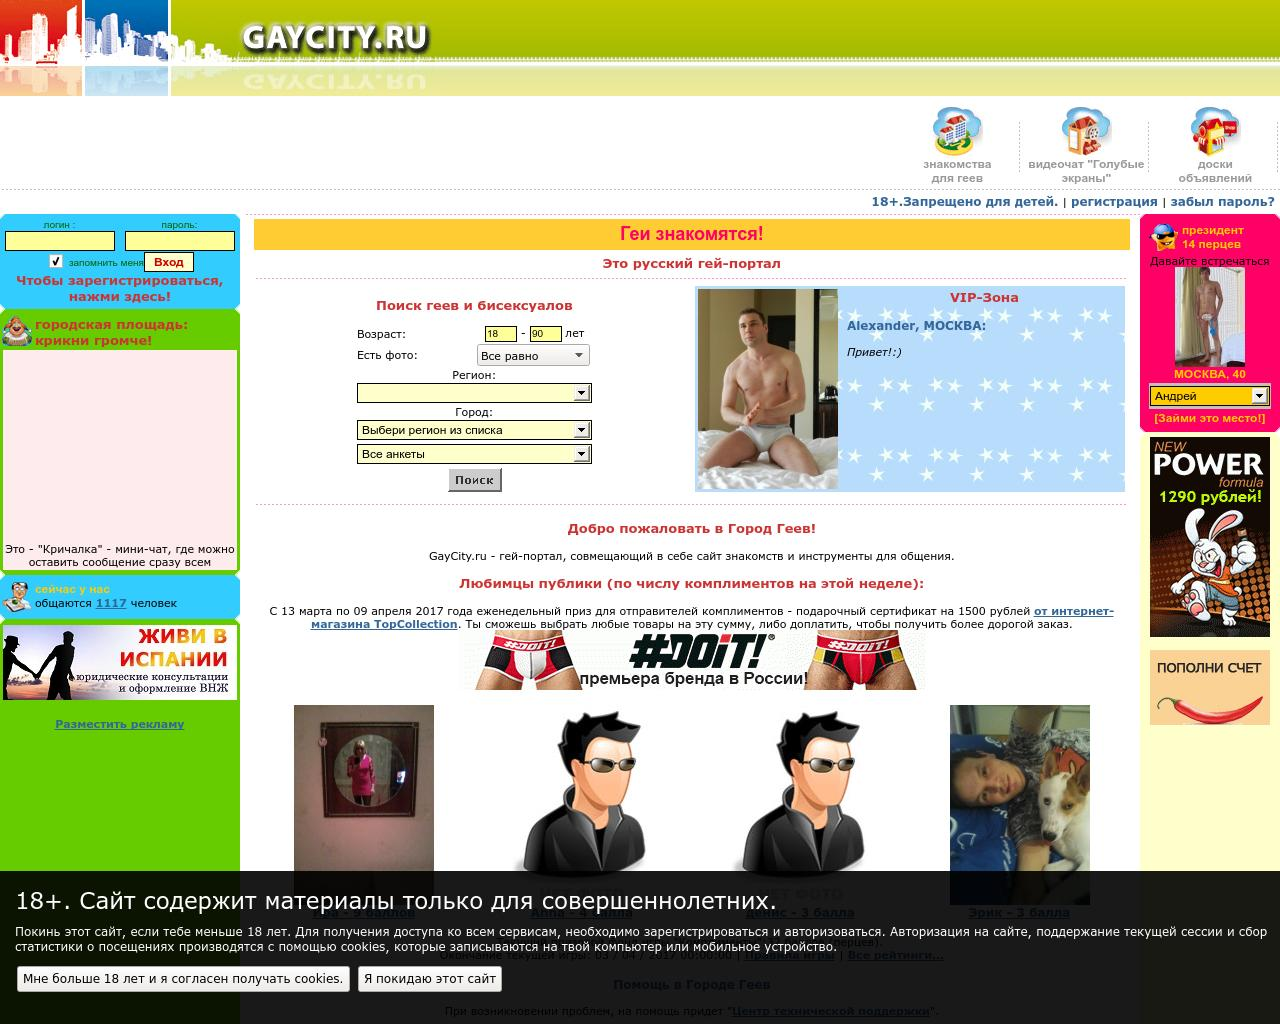 gey-chat-onlayn